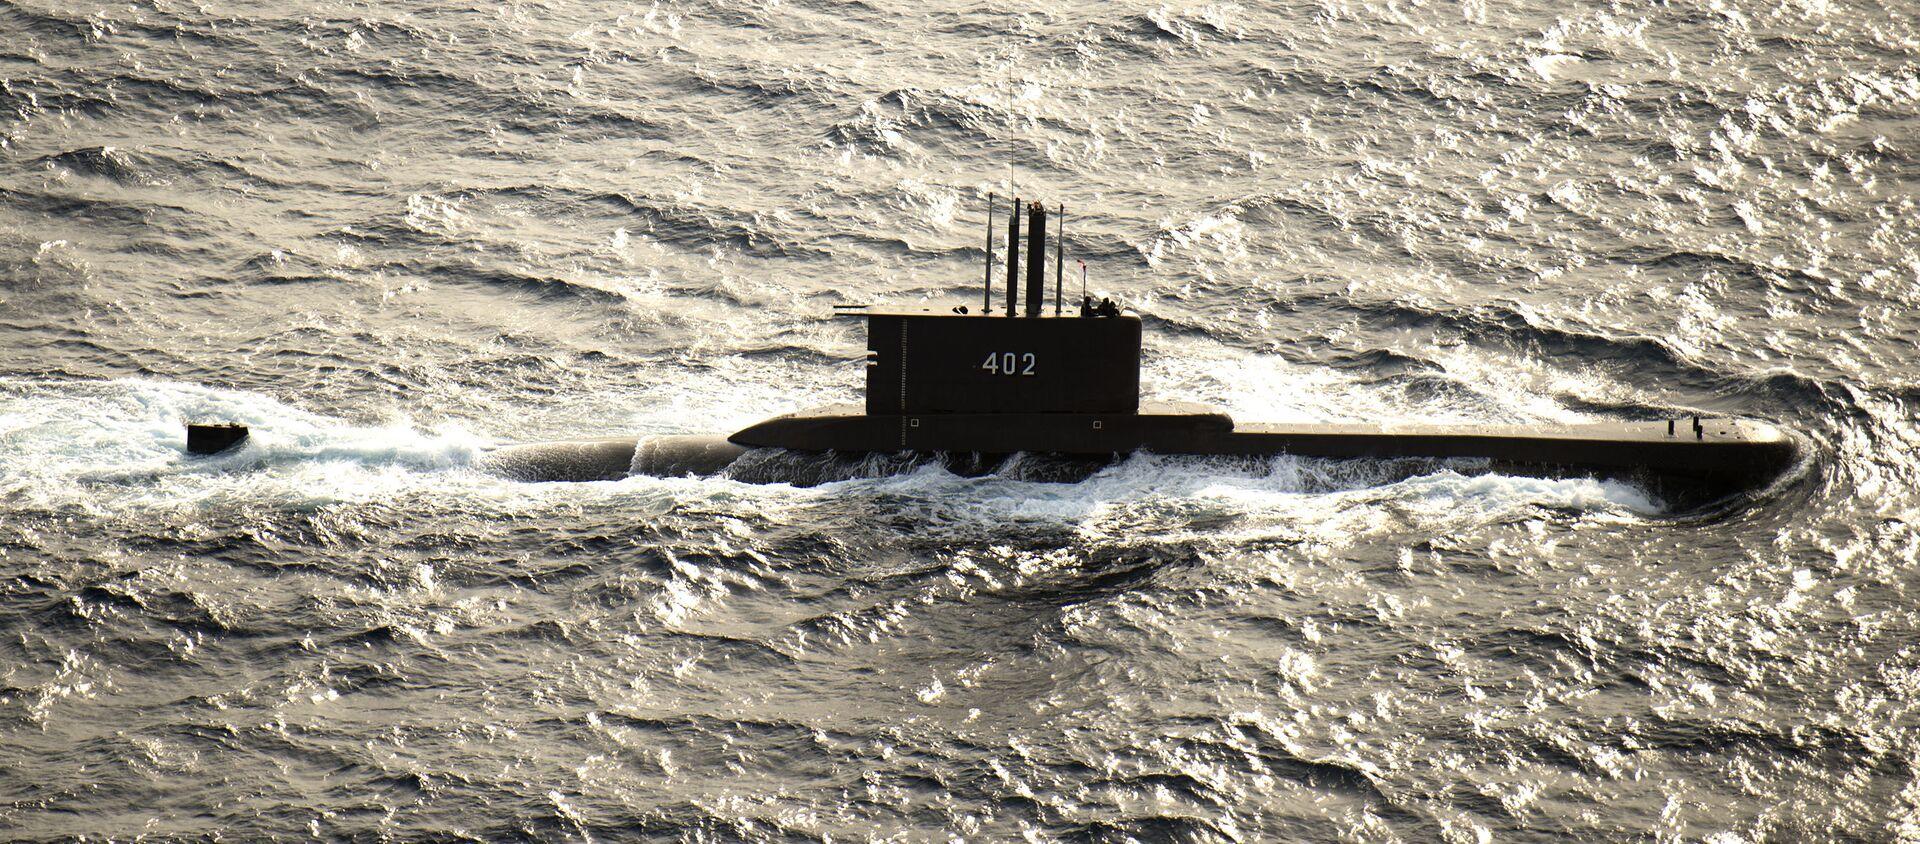 Il sottomarino indonesiano KRI Nanggala 402 - Sputnik Italia, 1920, 25.04.2021